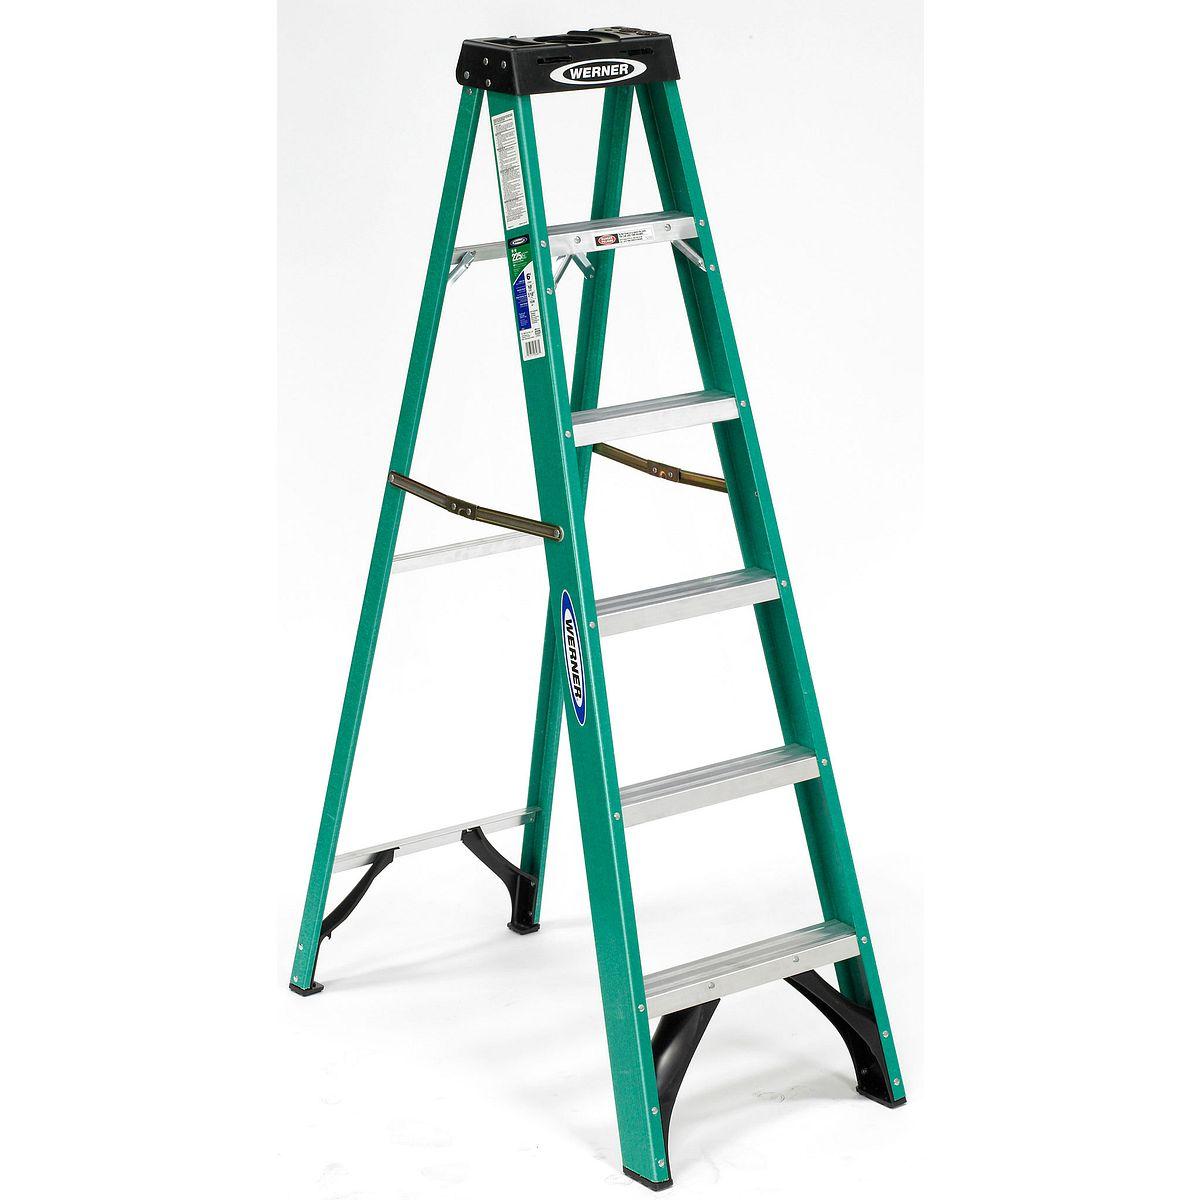 Fs206 Step Ladders Werner Us